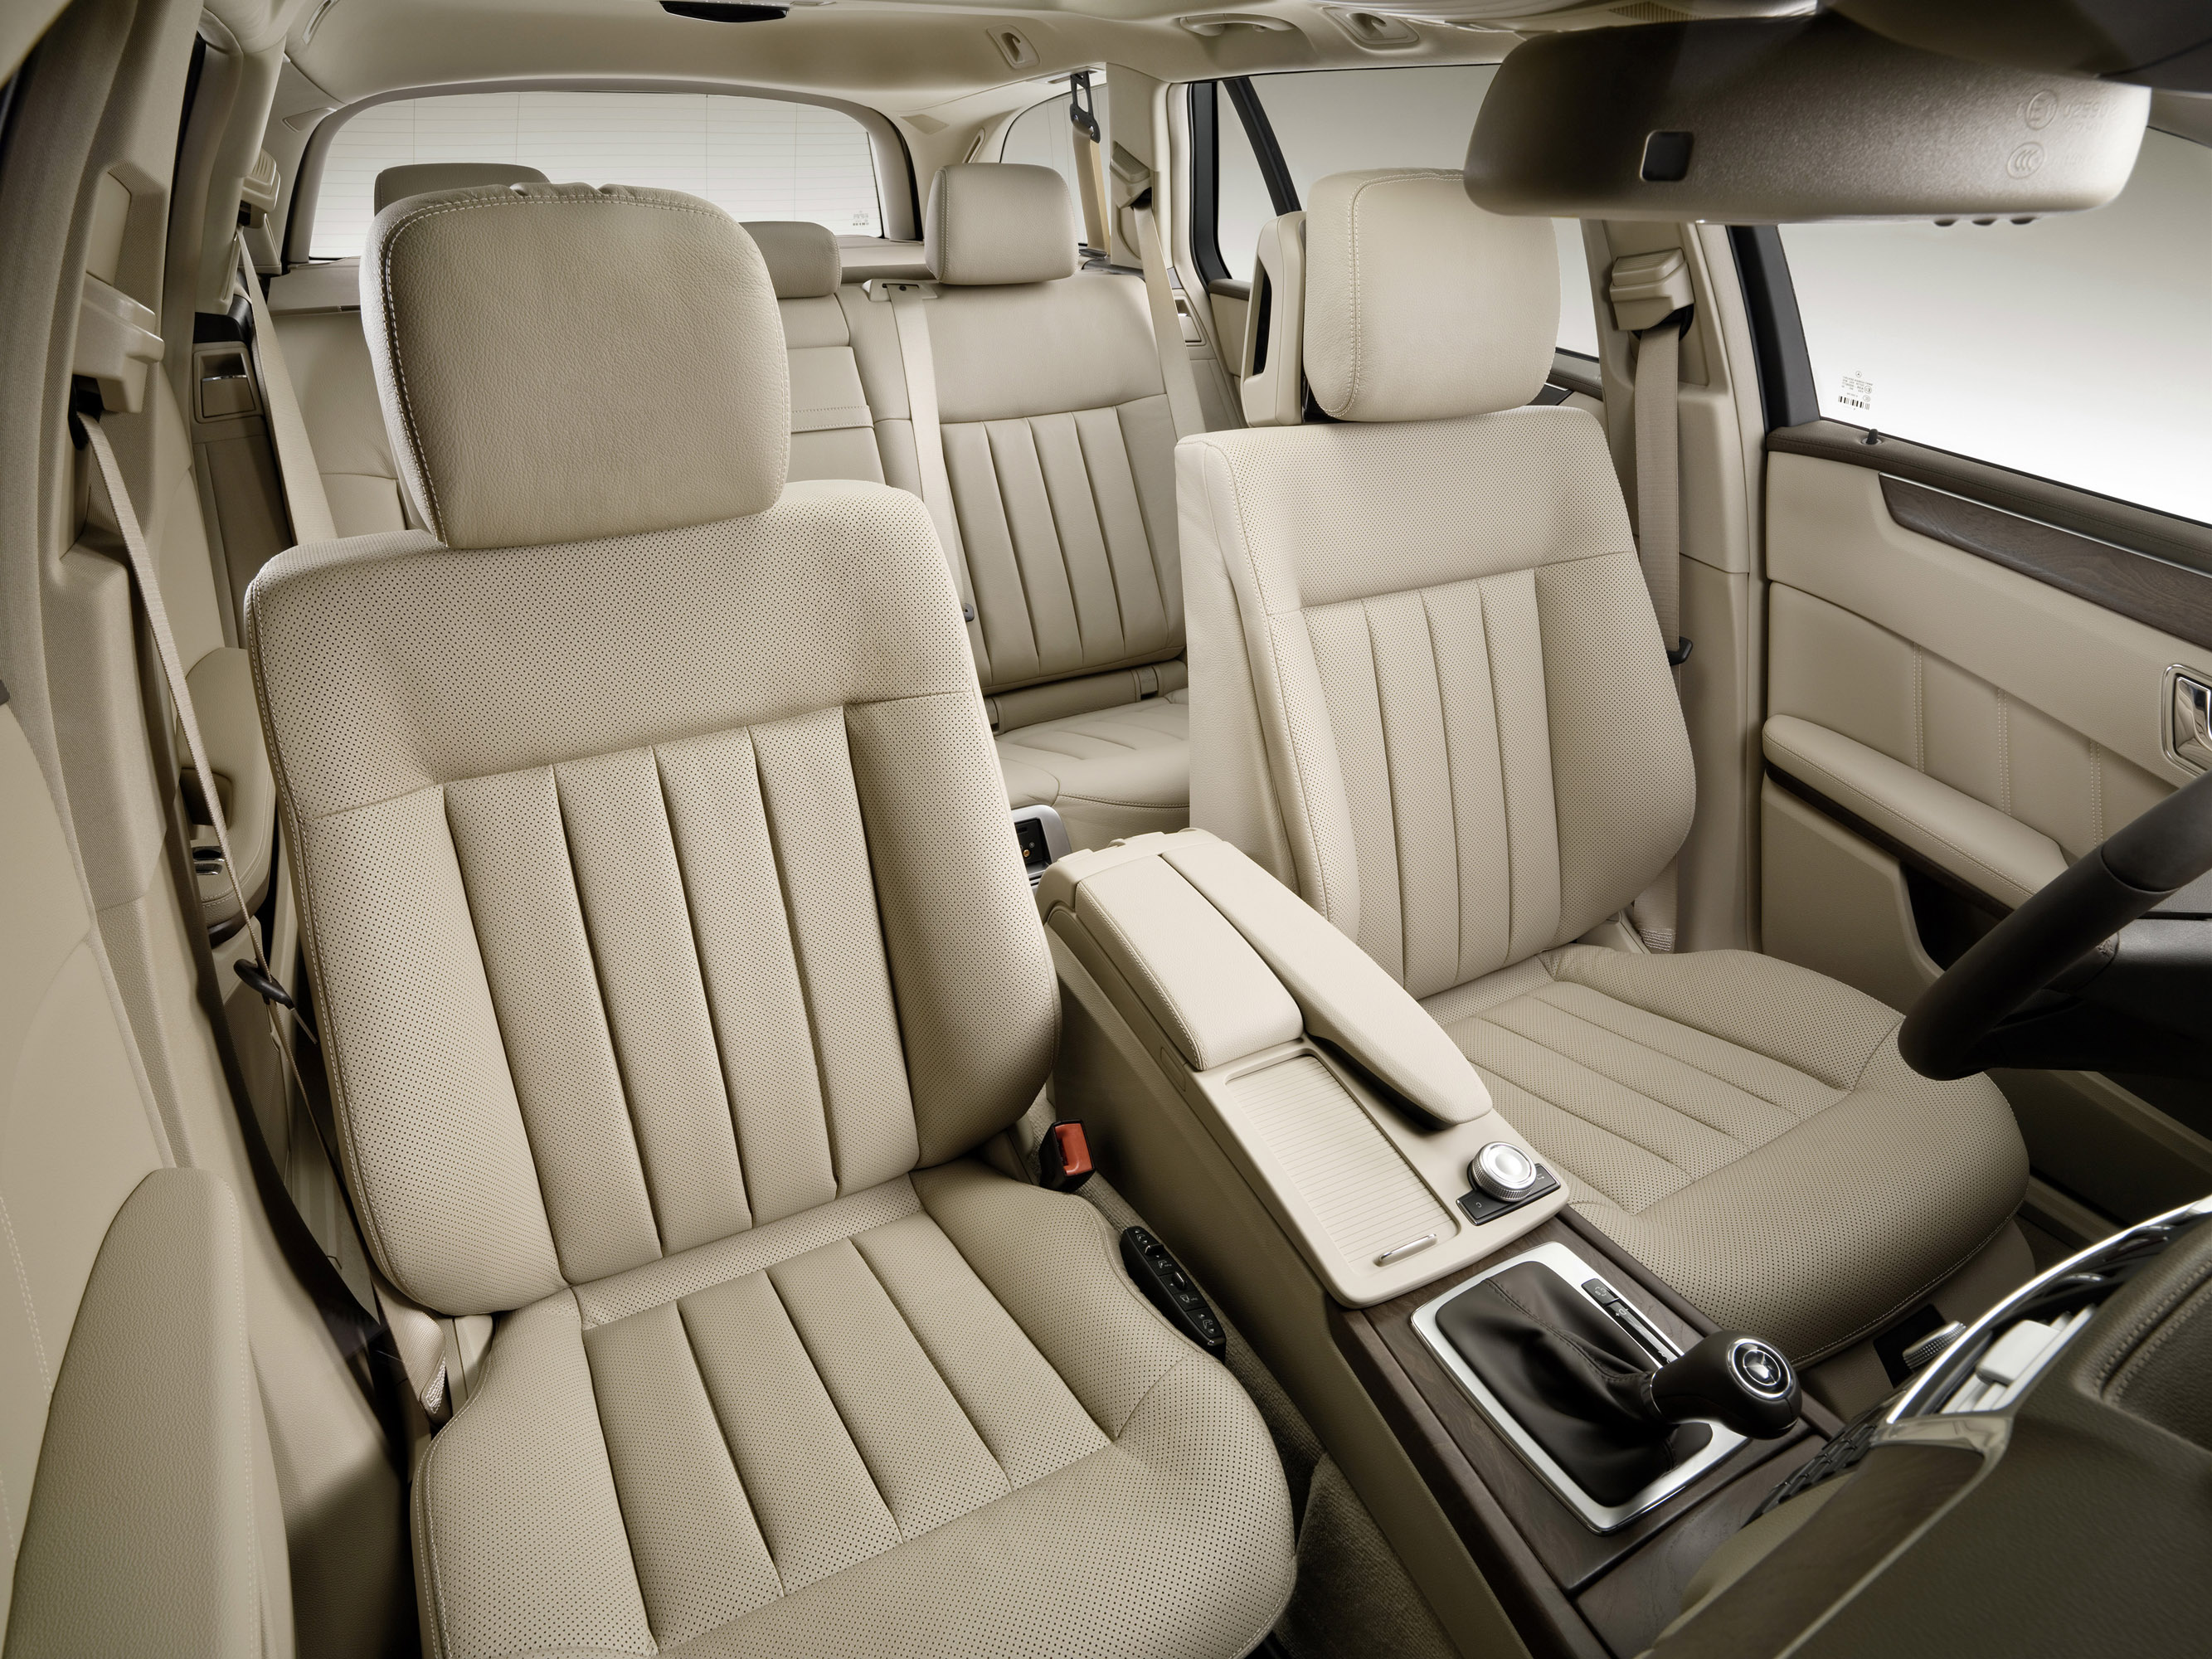 Mercedes-Benz E-Class Универсал - фотография №5